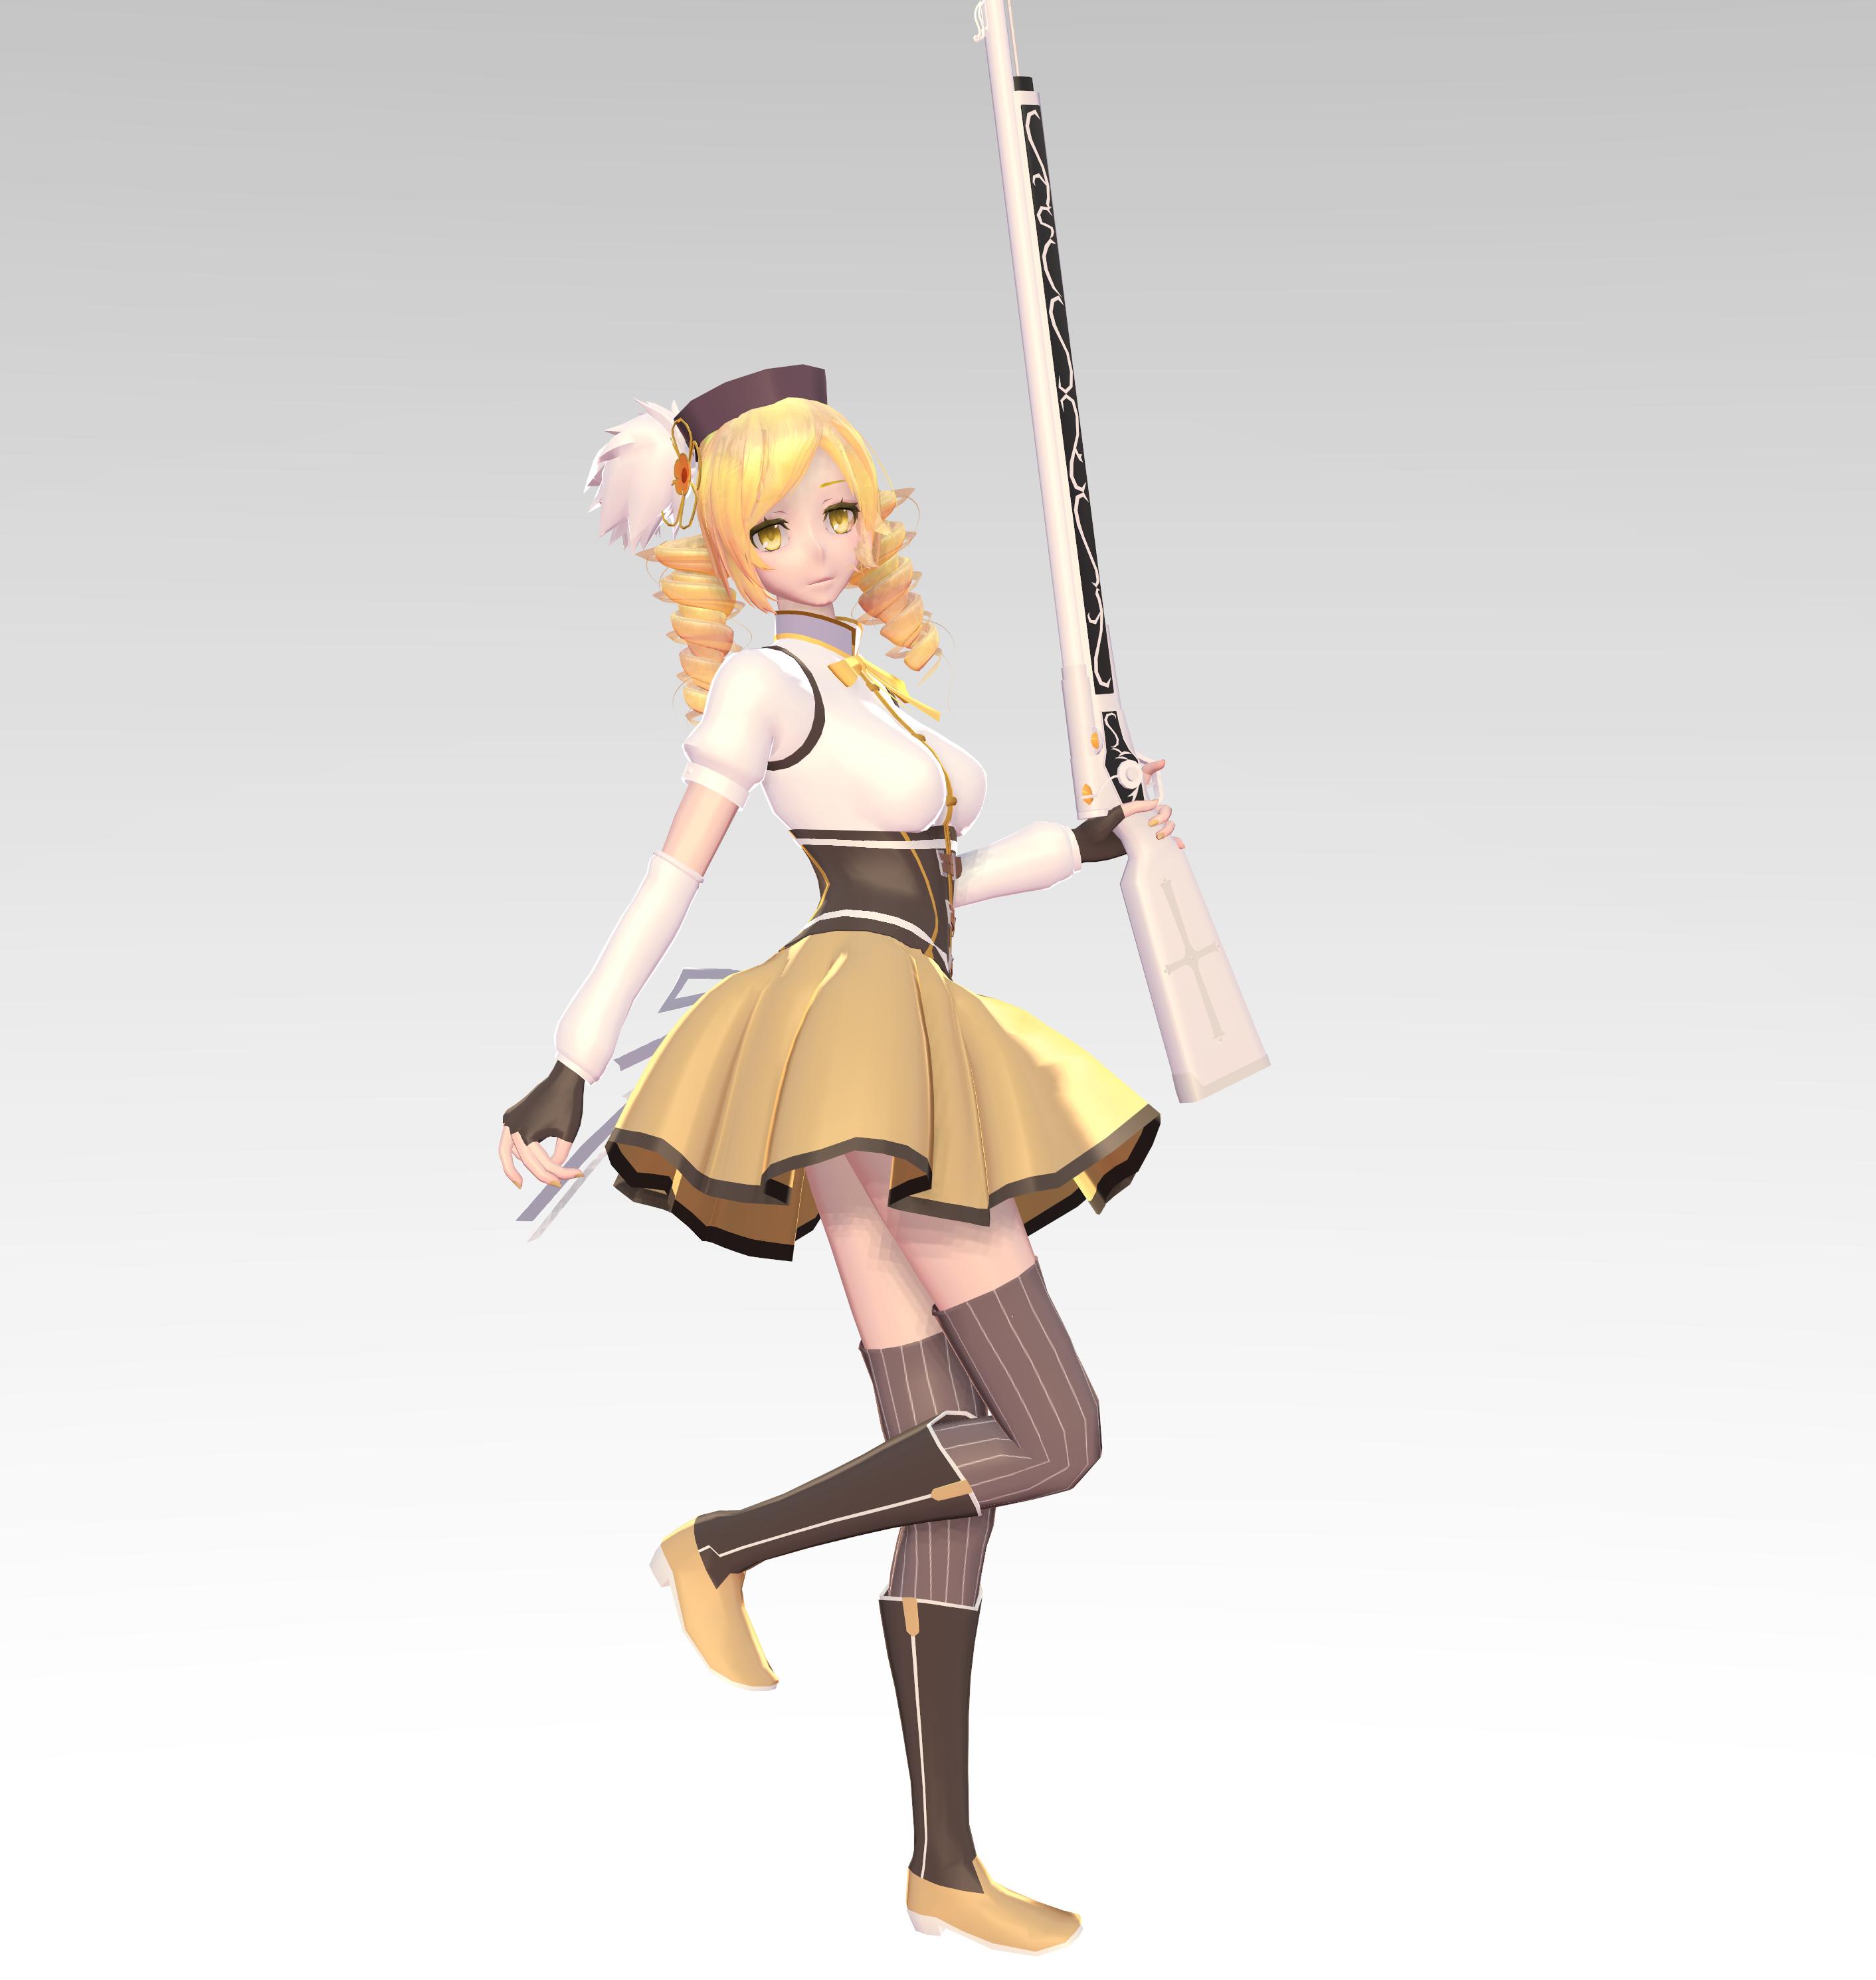 [MMD] HIT - Kiki Outfit 03 by arisumatio on DeviantArt